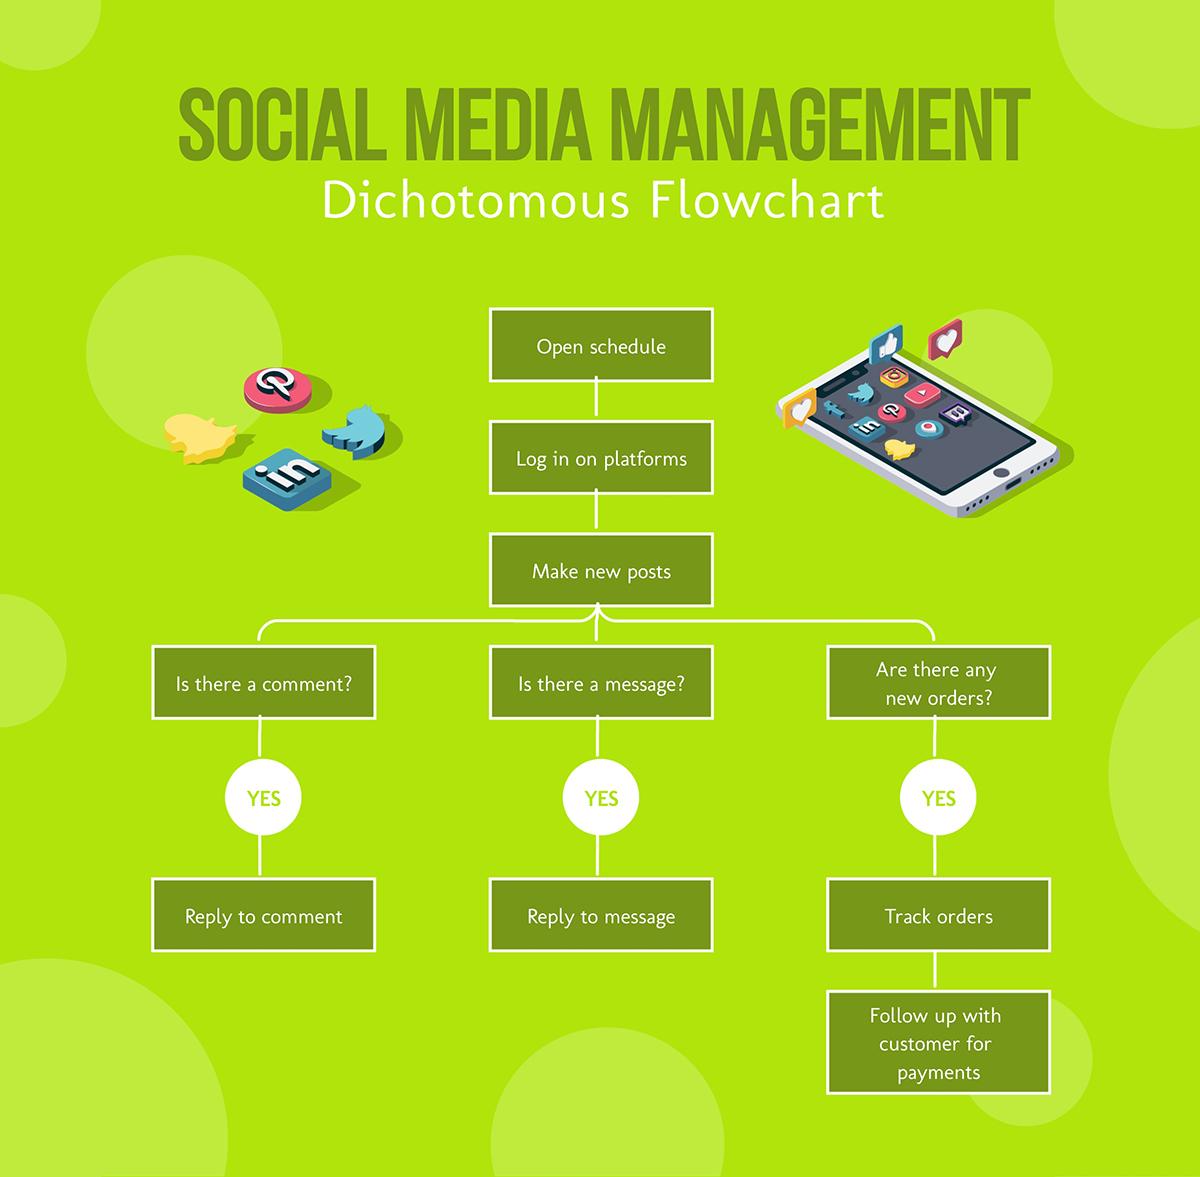 A social media management flowchart template available in Visme.